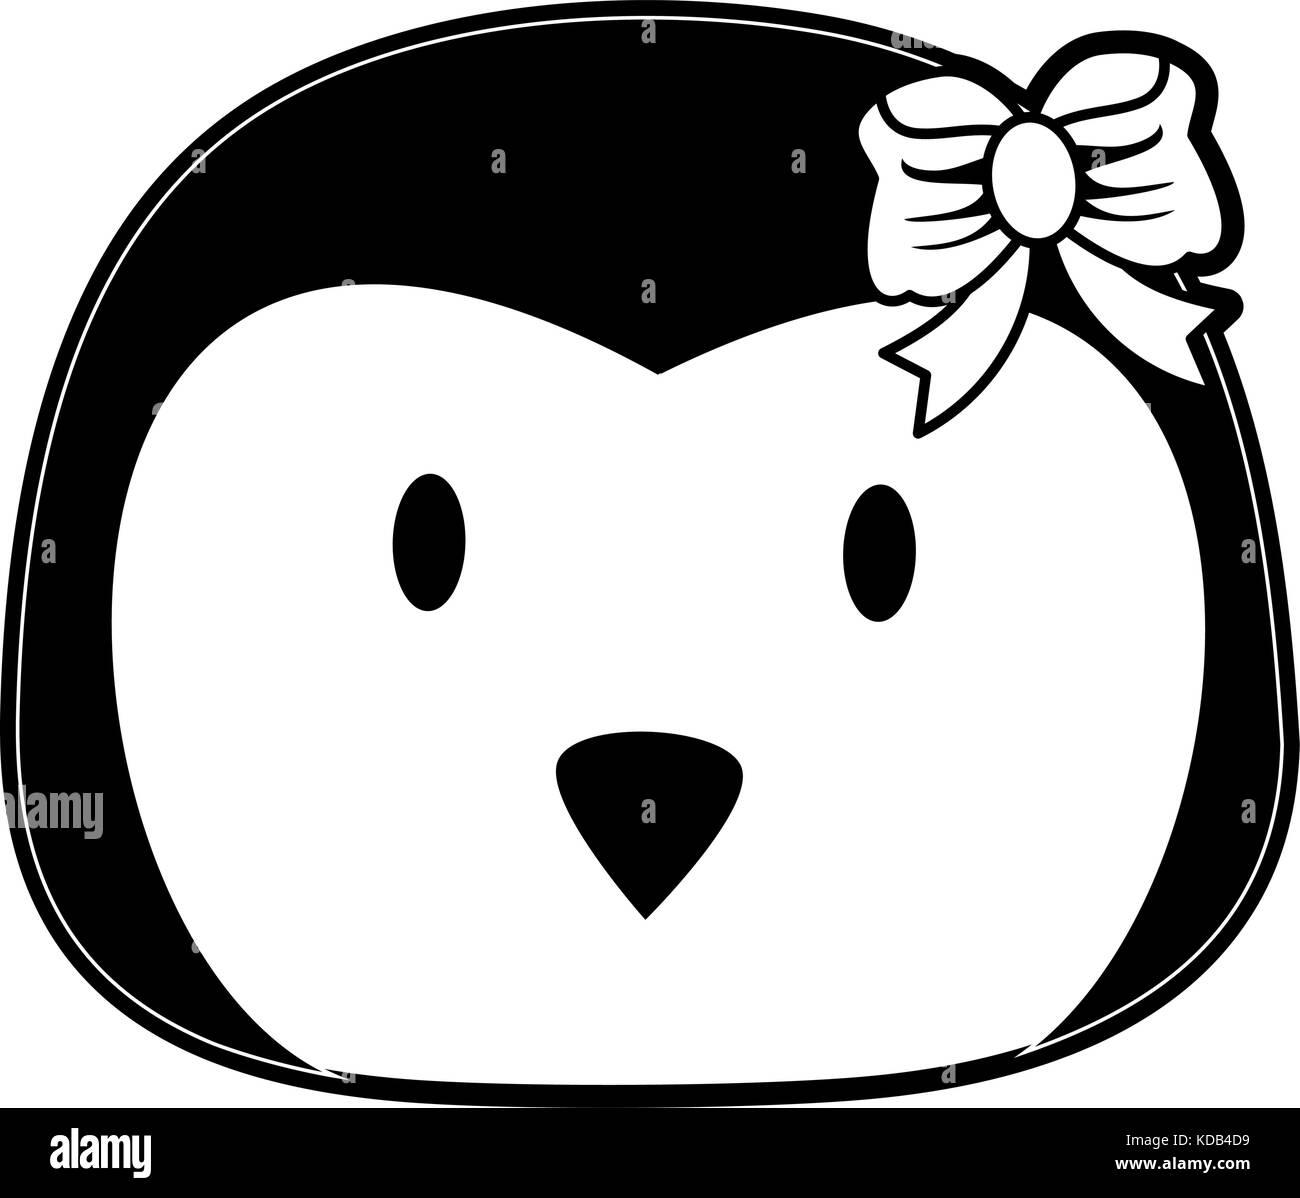 penguin cute animal cartoon icon image  - Stock Image